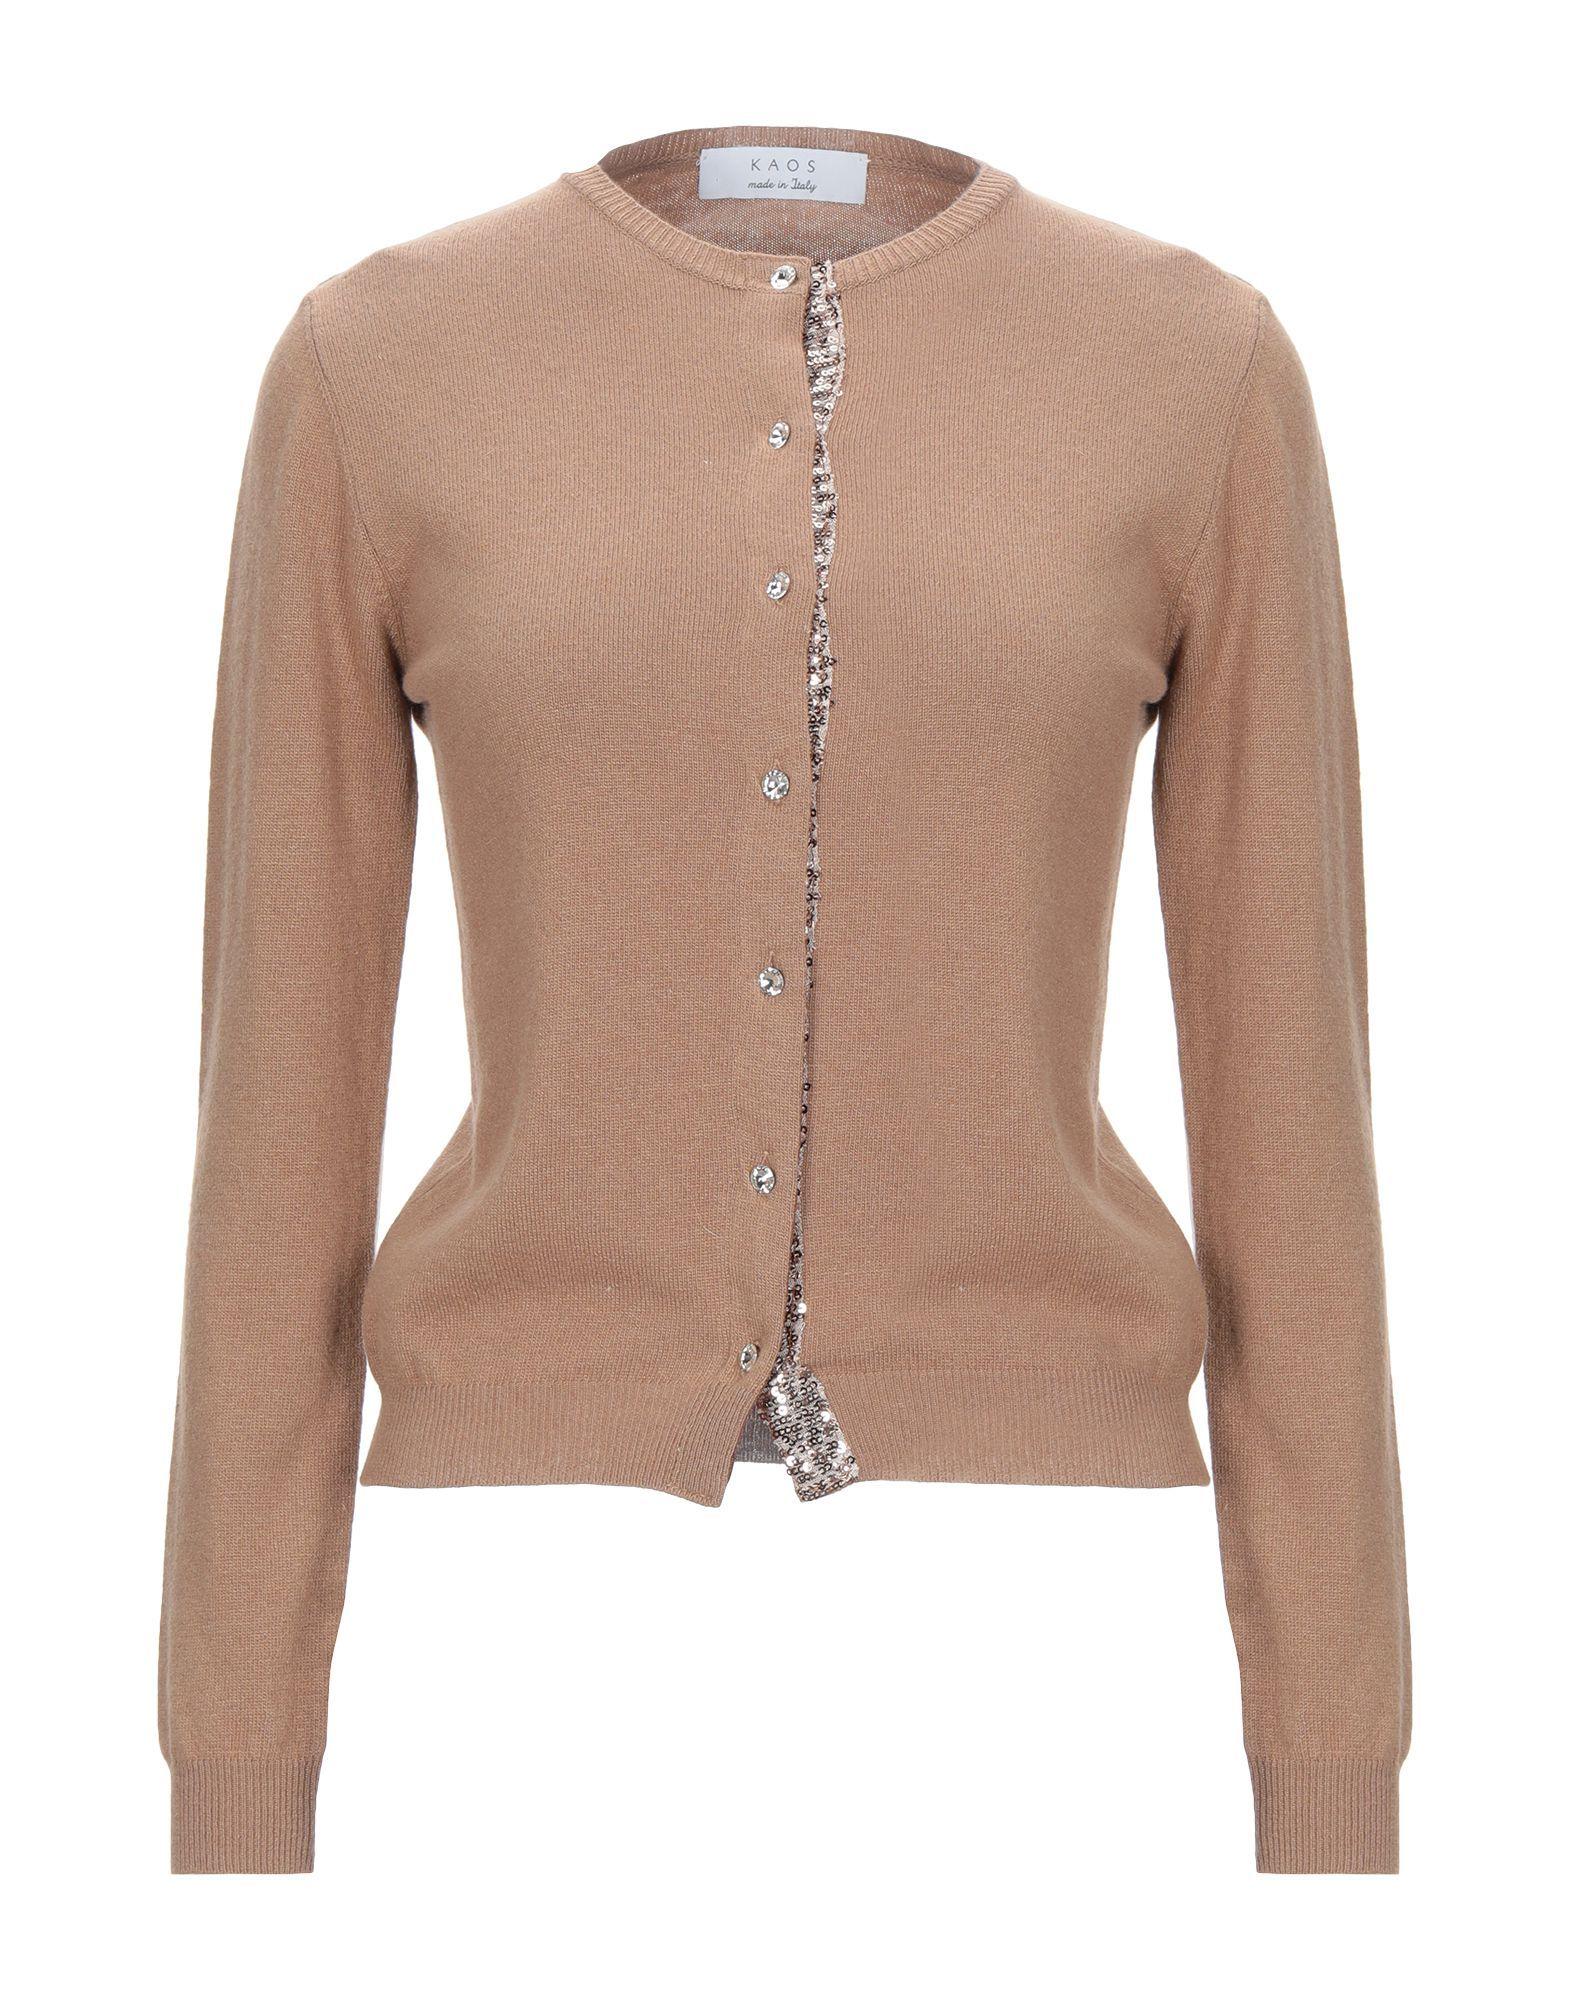 Kaos Camel Lightweight Knit Sequinned Cardigan